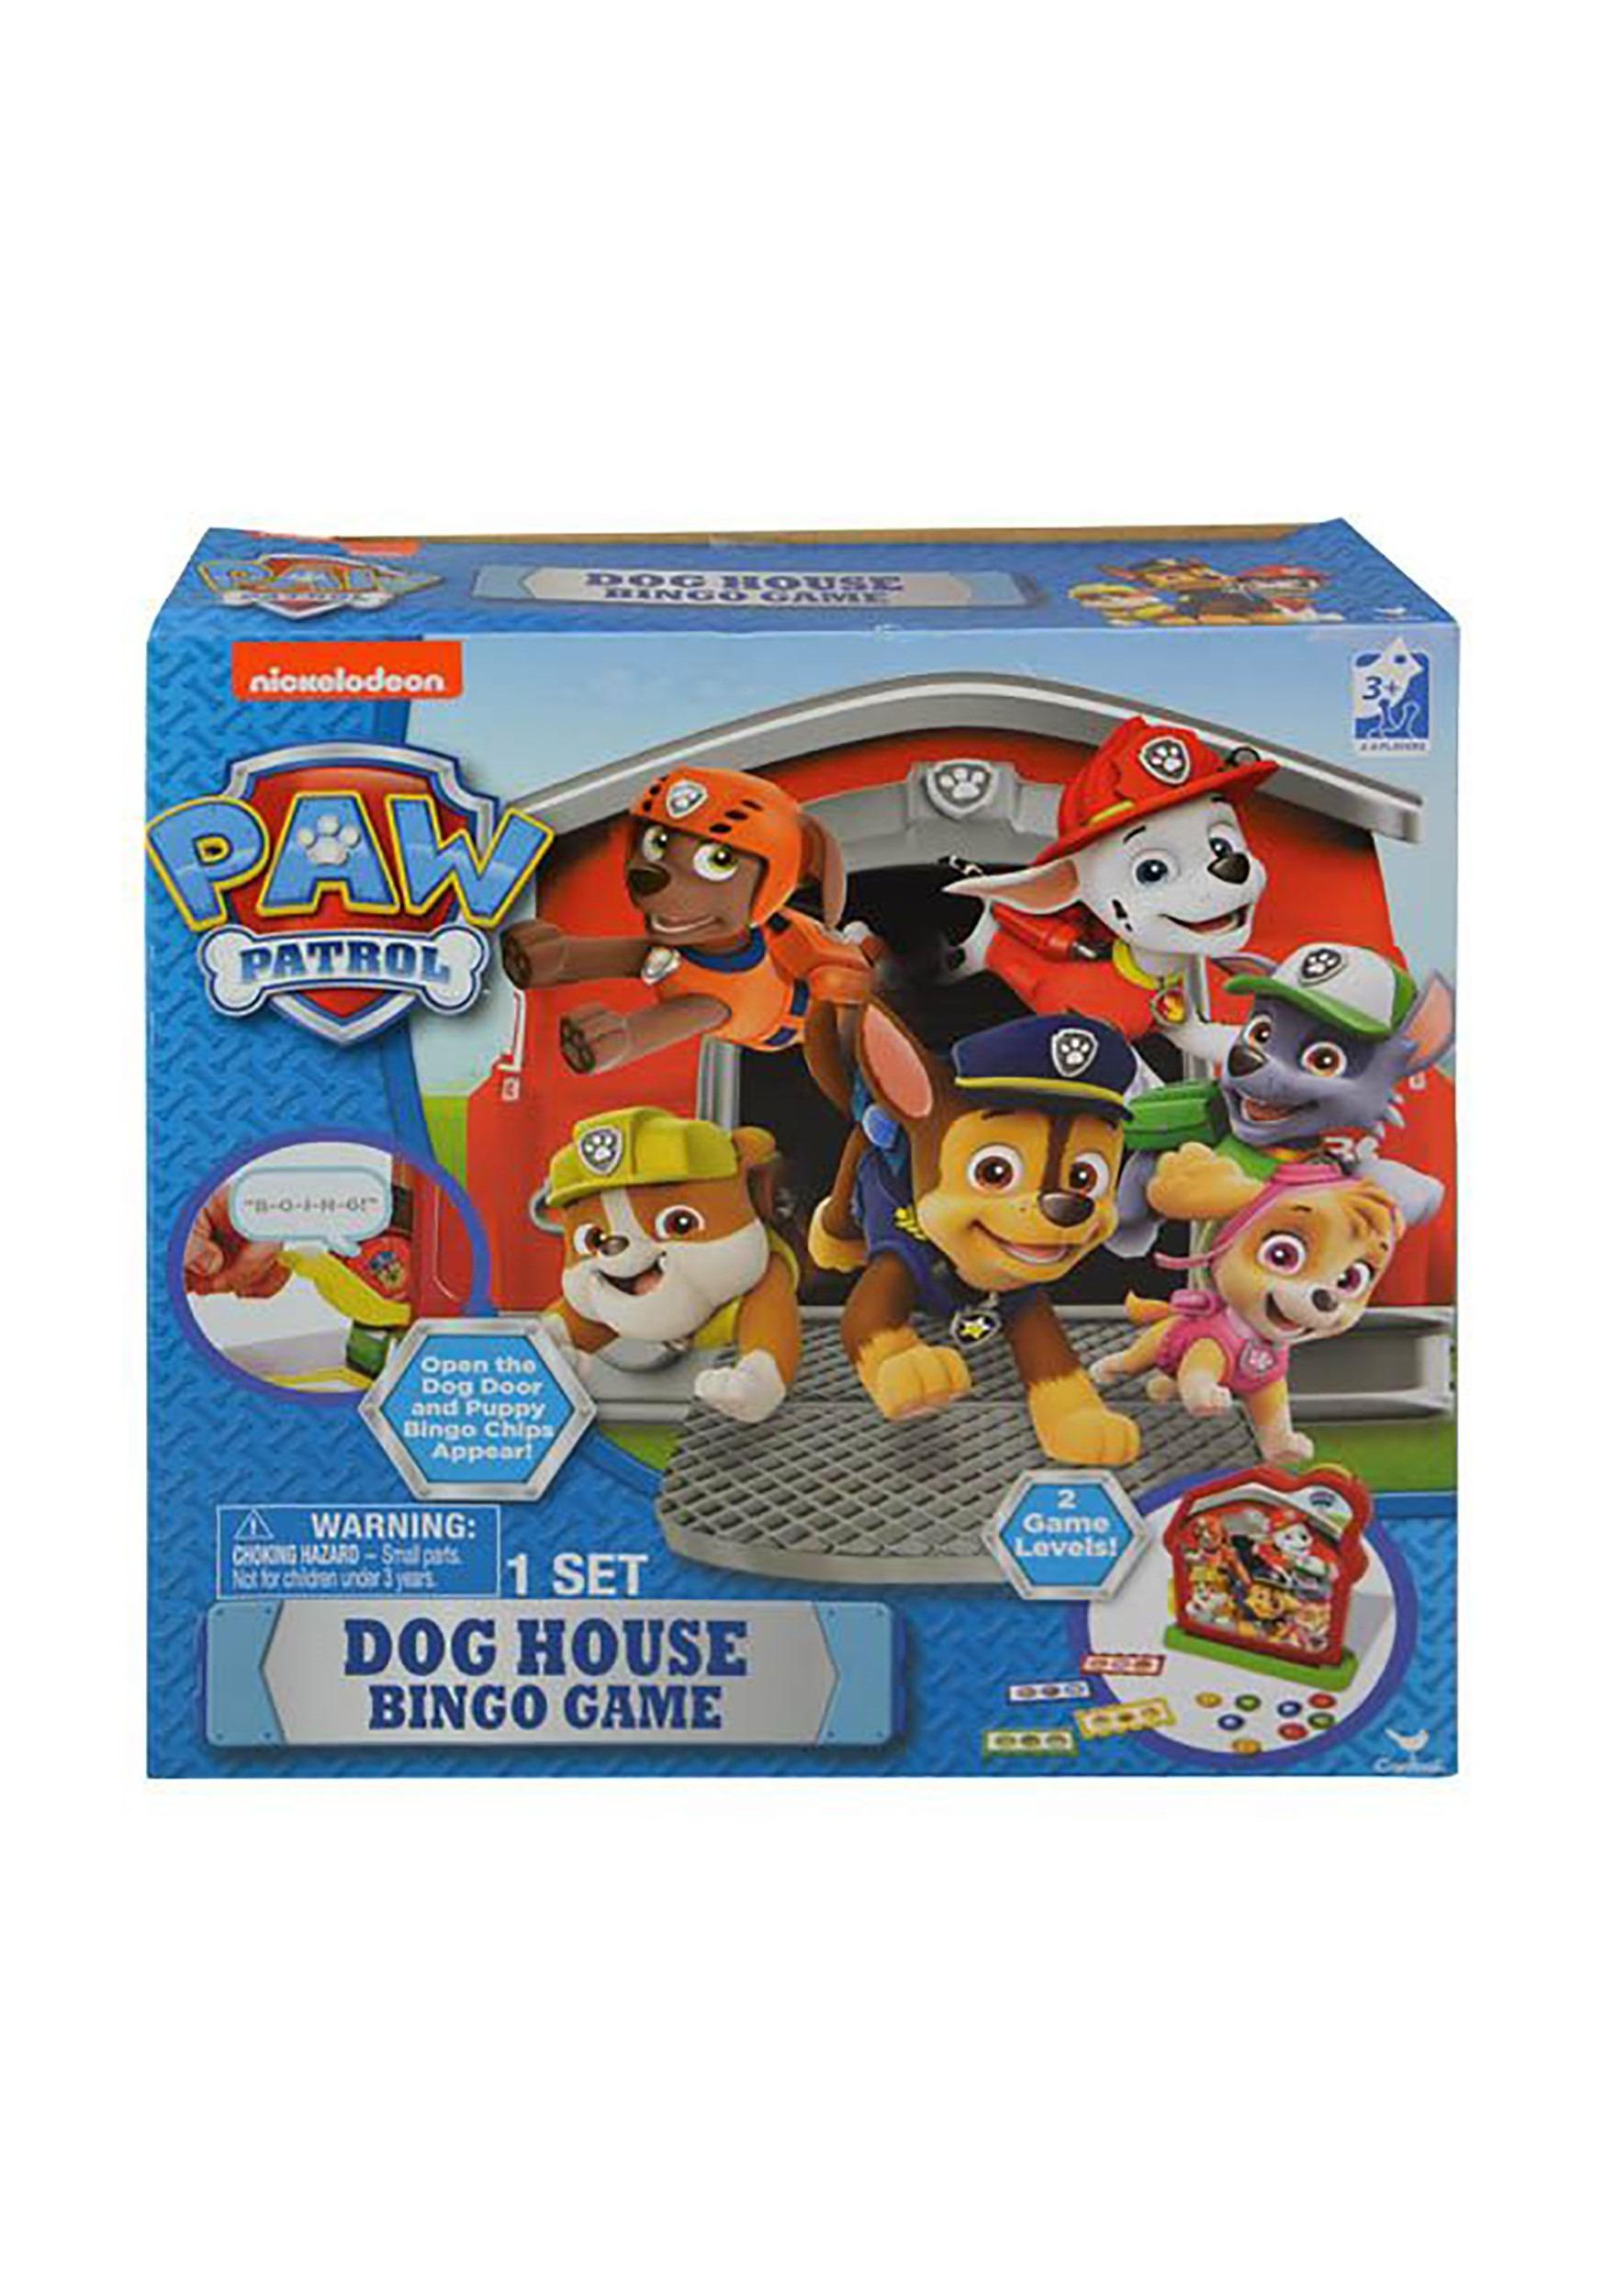 Dog House Paw Patrol Bingo Game